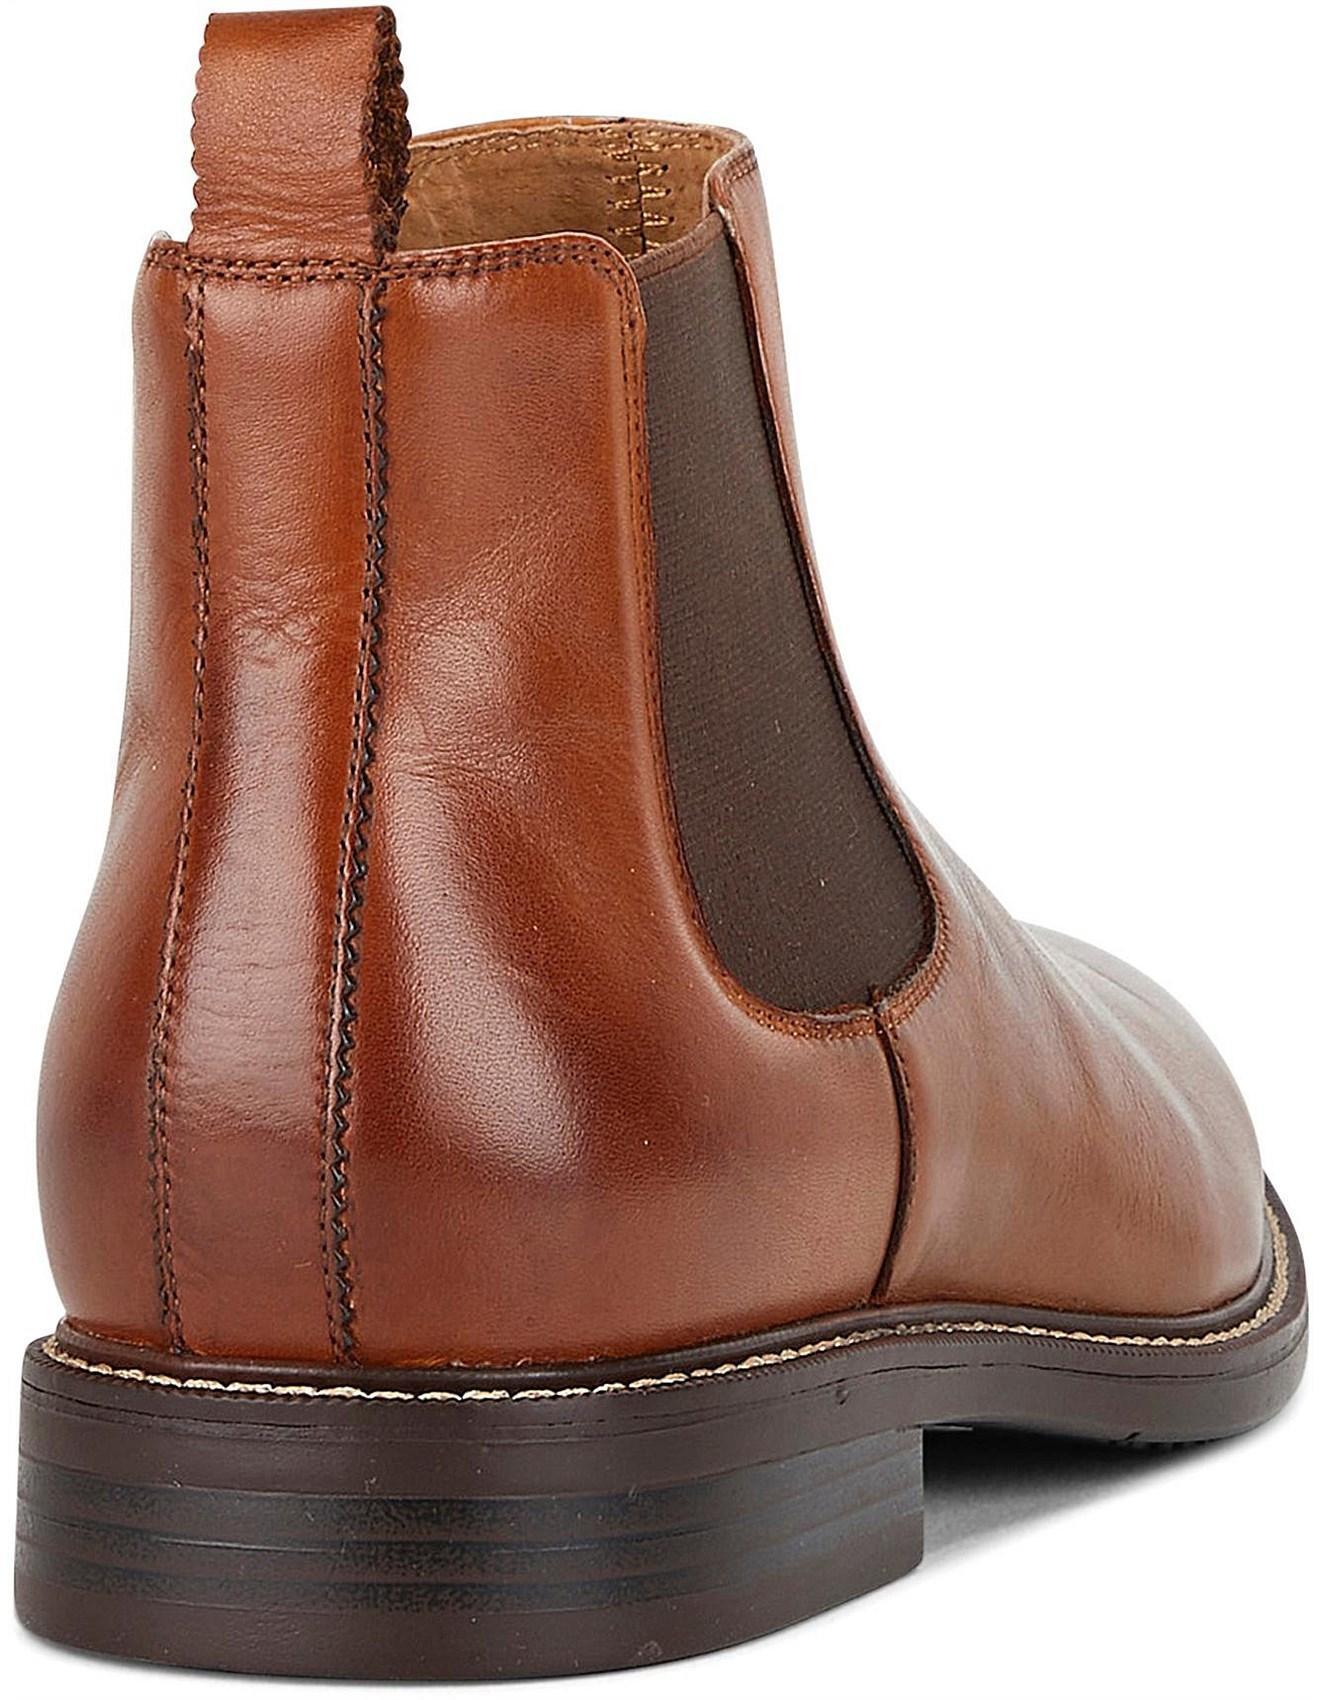 9bdf3849bdf Hush Puppies Hanger Chelsea Boot in Brown for Men - Lyst